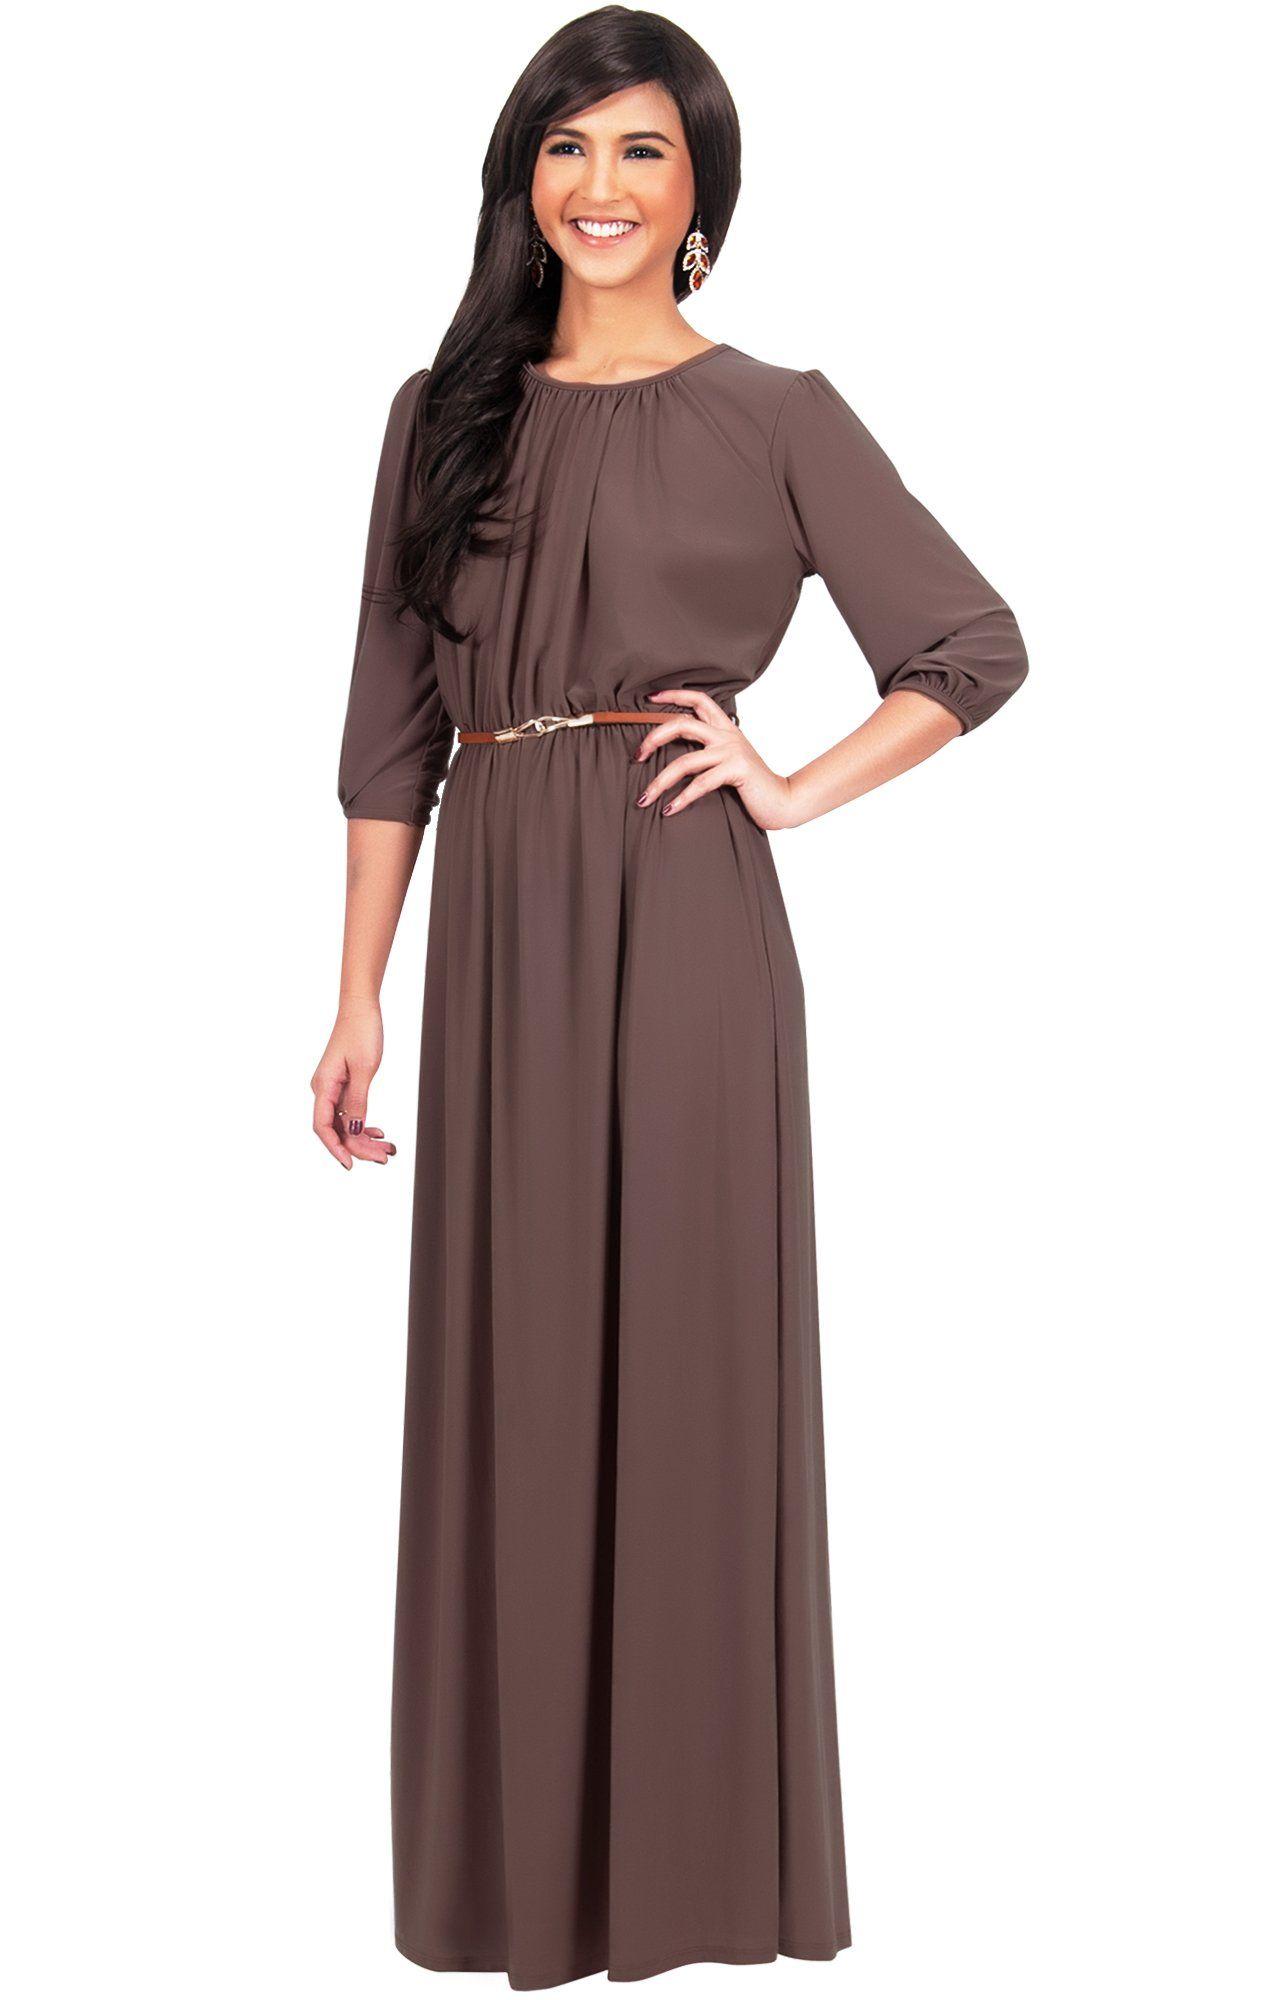 f71980f790d8 Maternity Fashion - best maternity maxi dress : KOH KOH Women Long 3/4  Sleeve